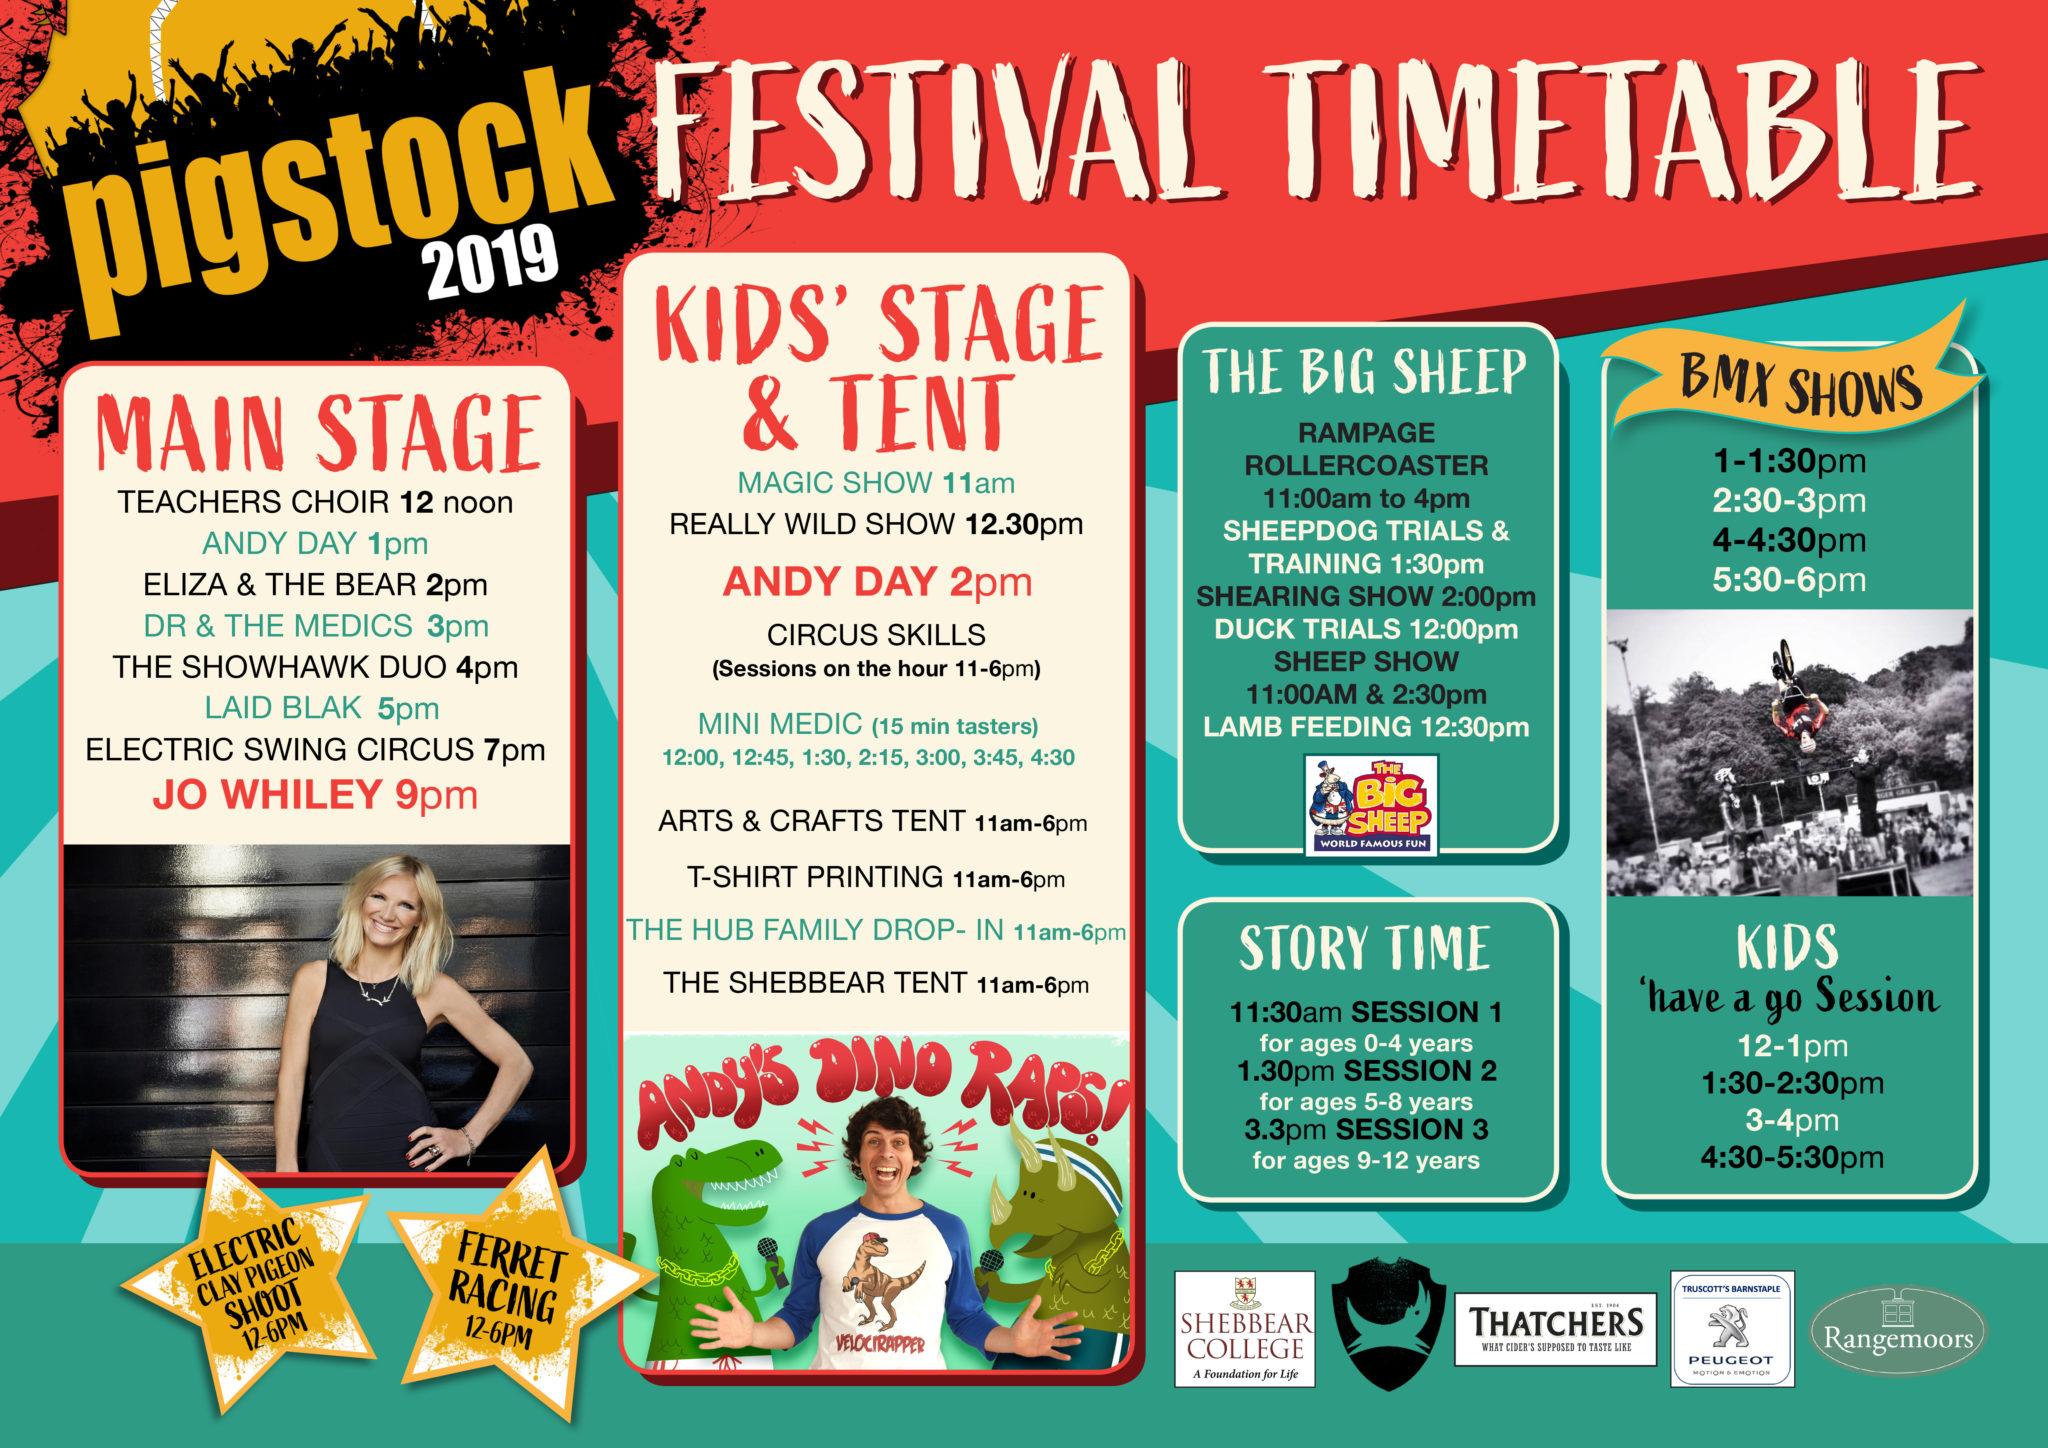 Lineup/Timetable   Pigstock Festival 2019